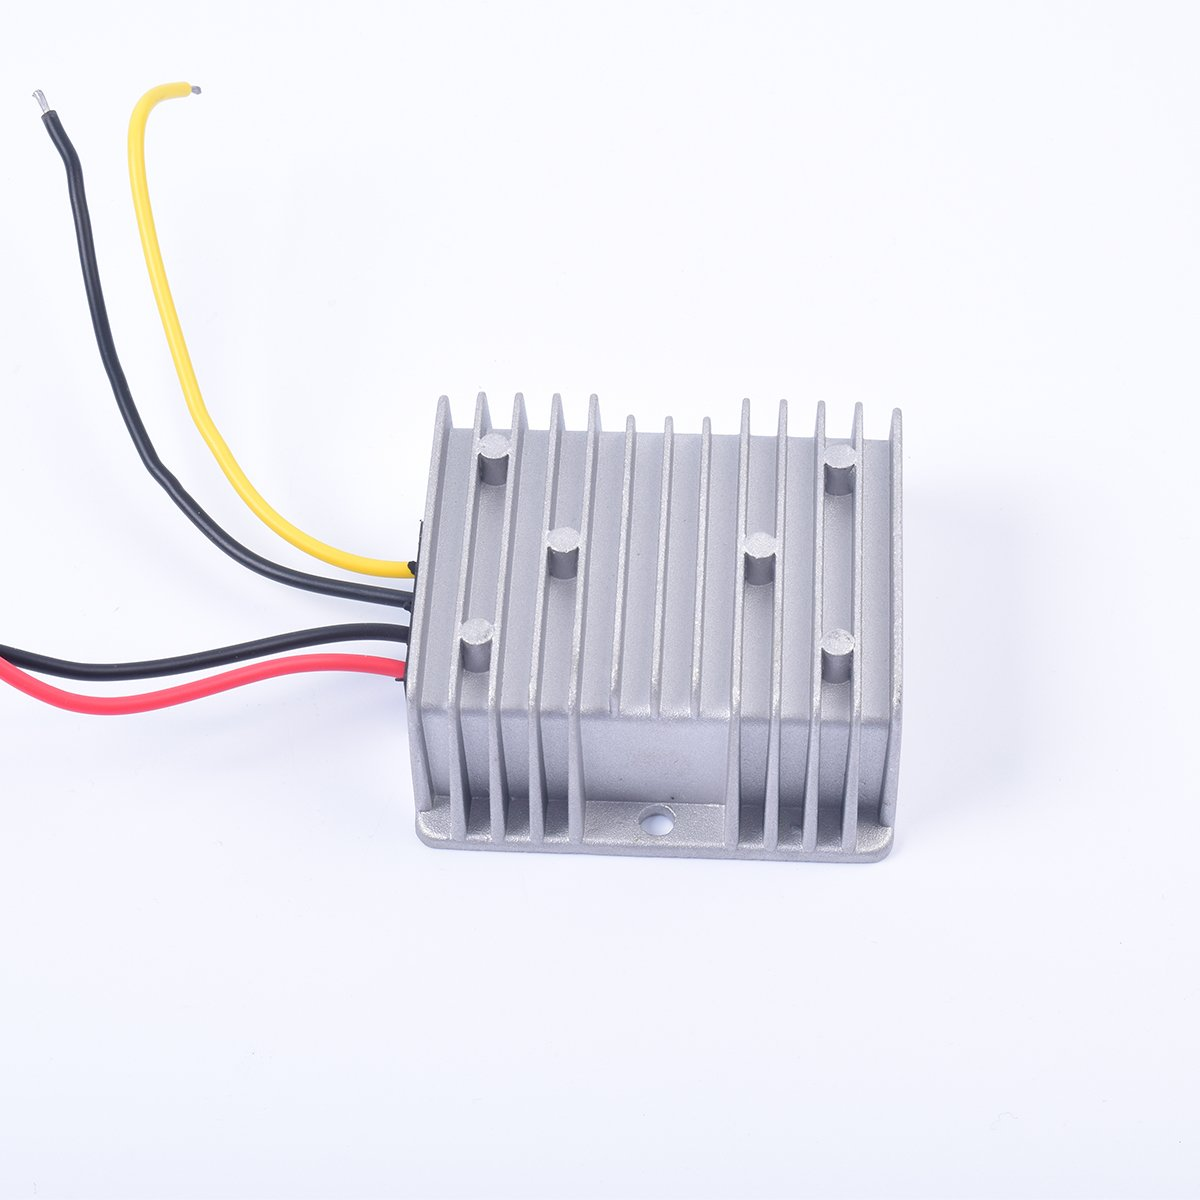 Car DC 12V 4A Voltage Stabilizer Surge Protector Power Supply Regulator for Auto Truck Vehicle Boat Solar System etc. EKYLIN 12T12-4A DC10-36V Input, DC12V Output